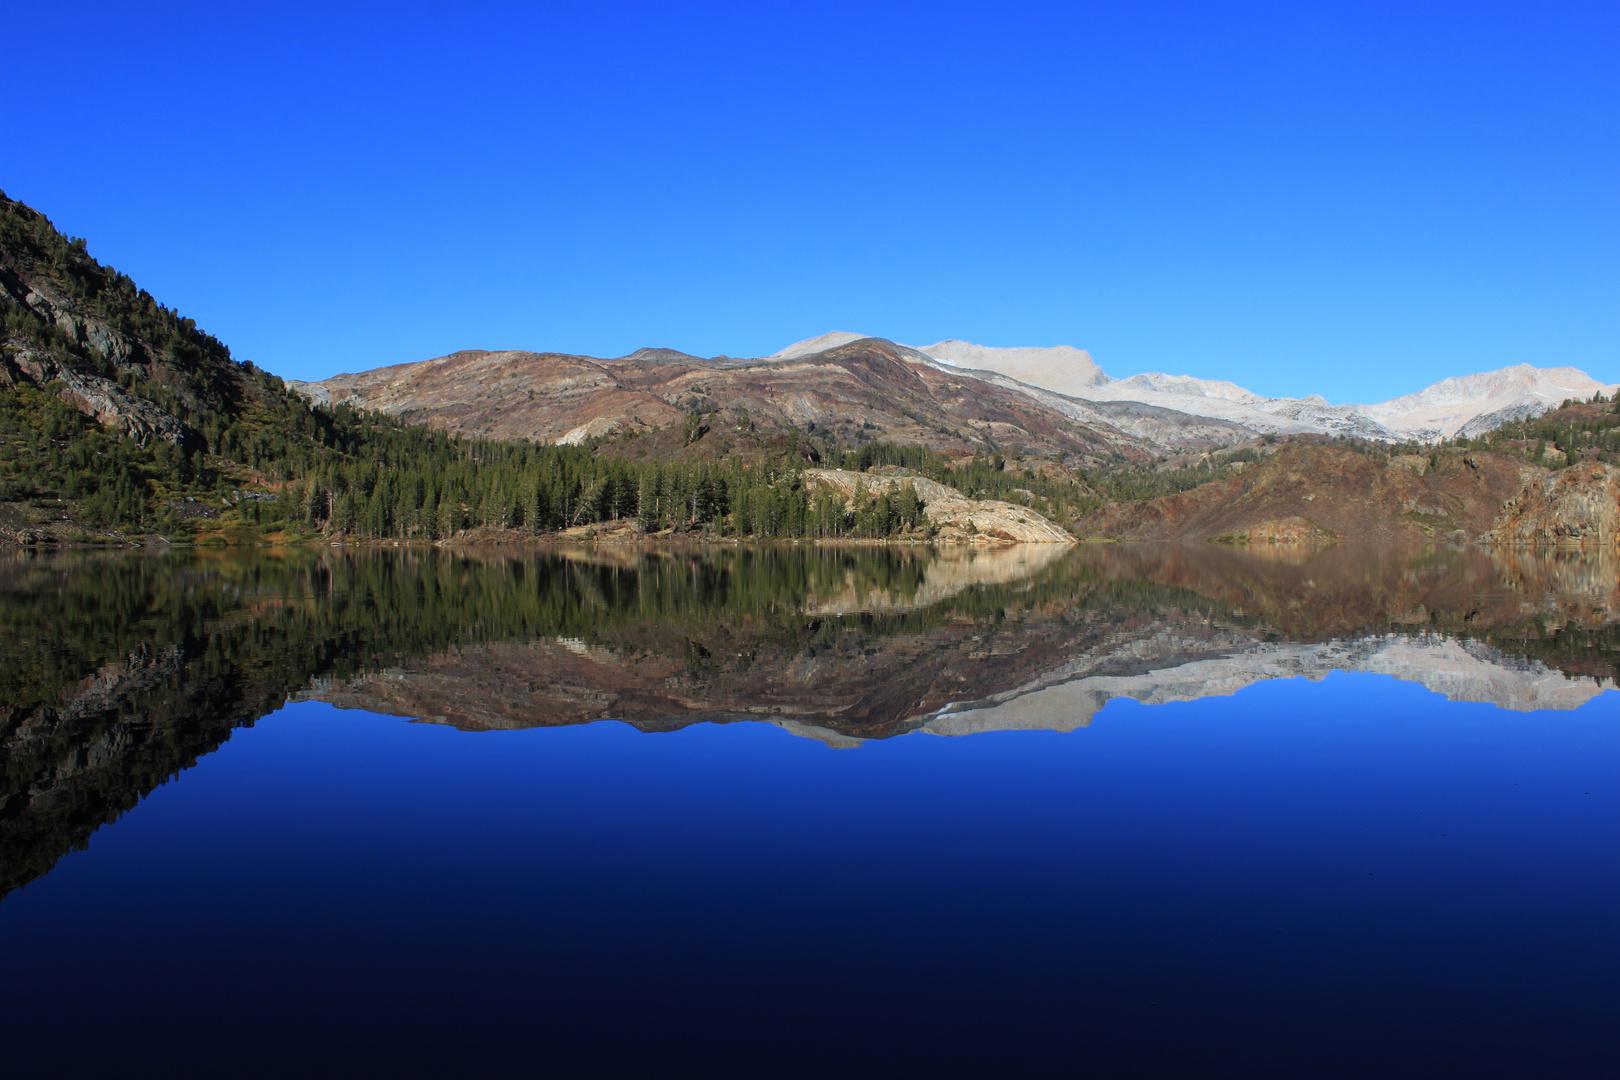 Ellery Lake - Tioga Road - Yosemitee Nationalpark